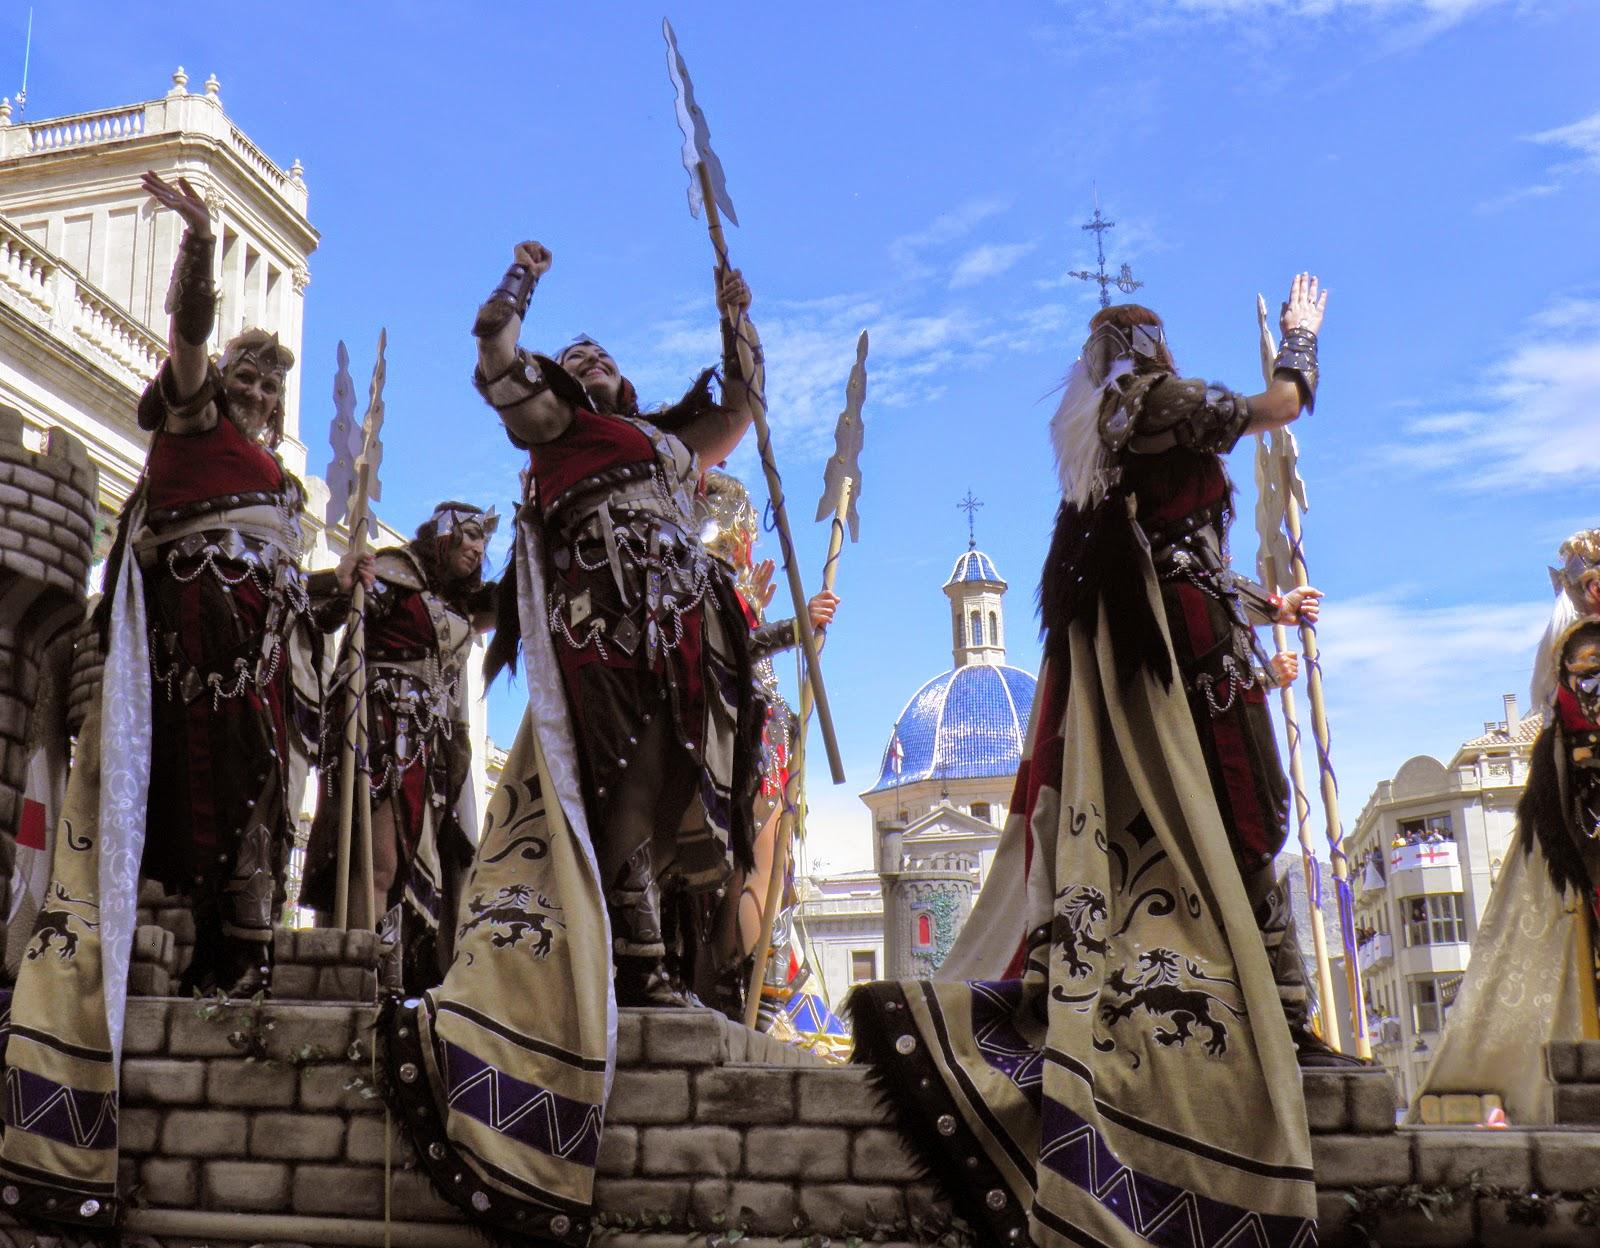 ... , Quatretondeta, Spain.: Moors and Christians Fiestas of Alcoy - 2016